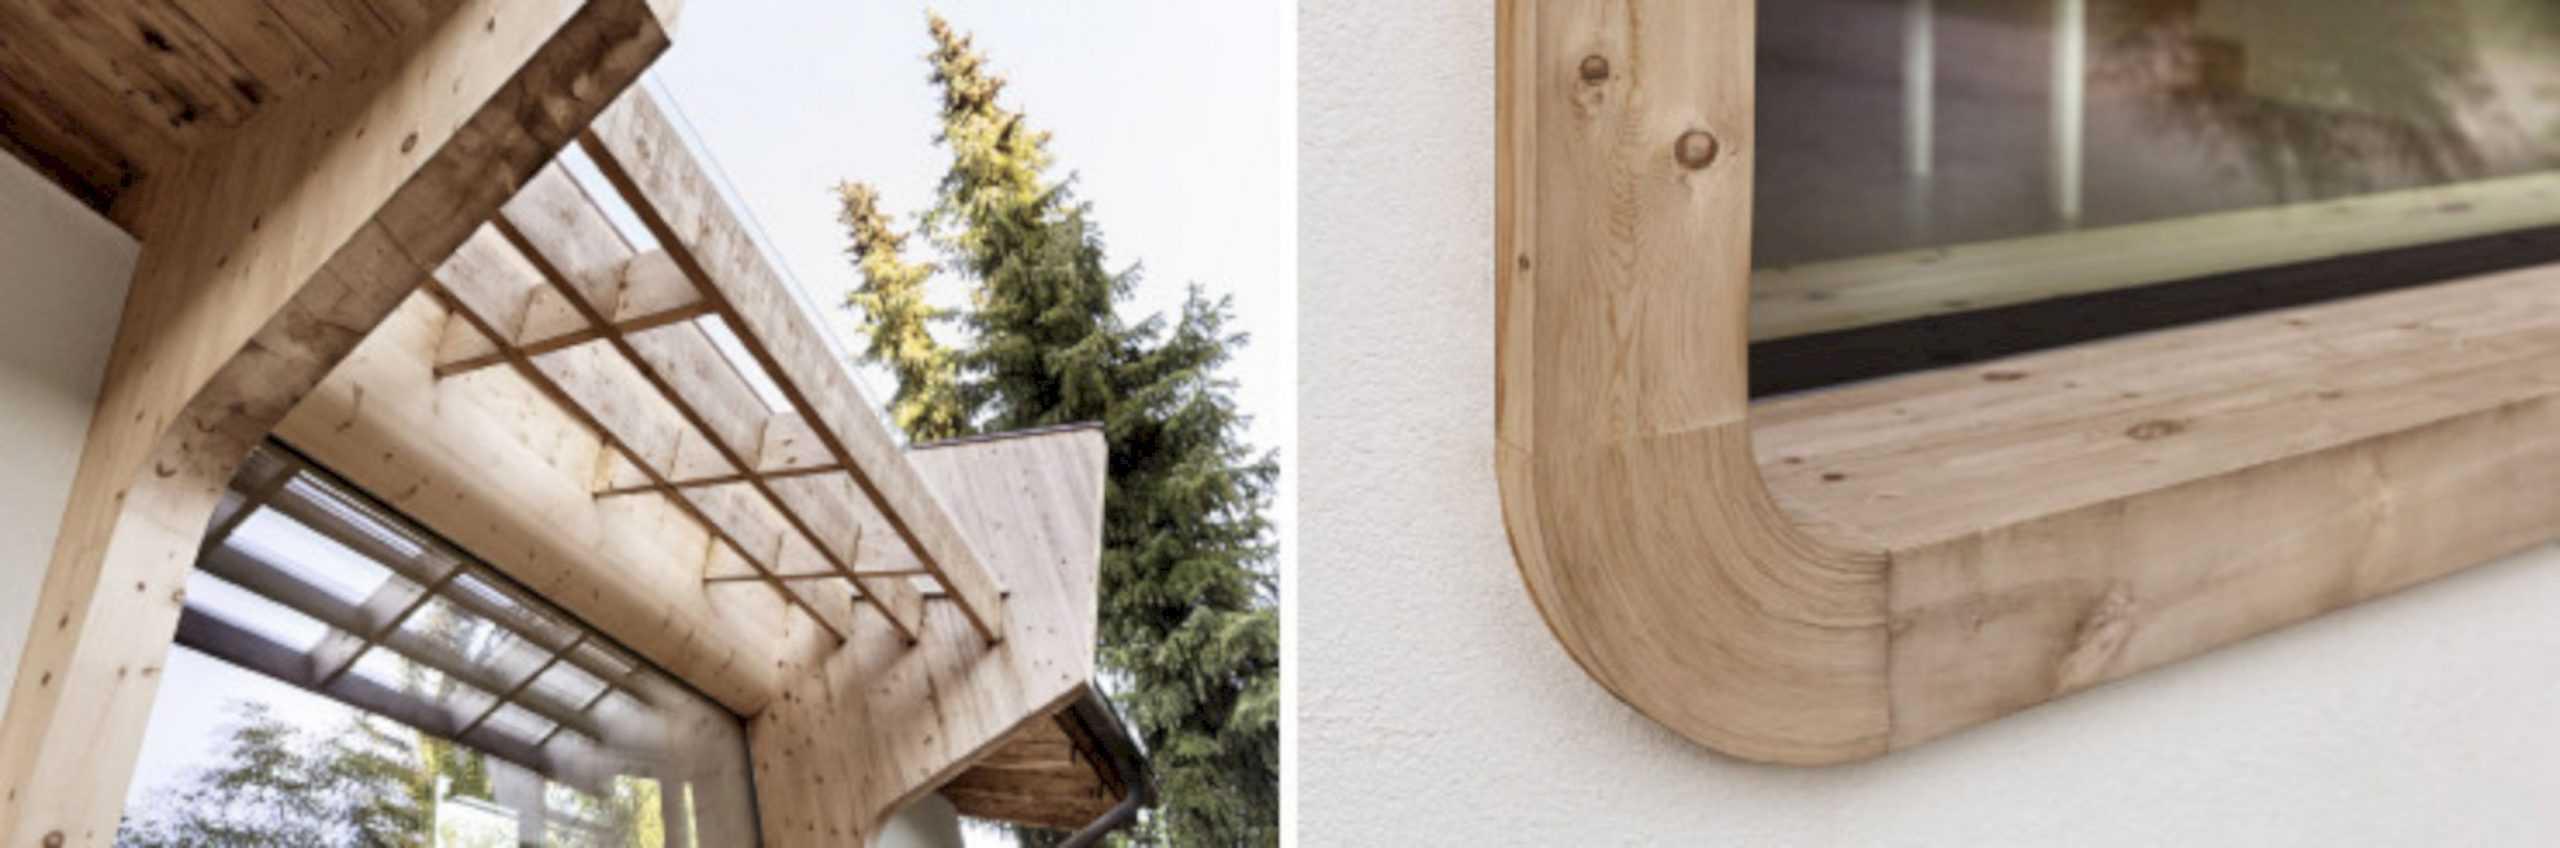 Studio Franz Messner Renovation 1